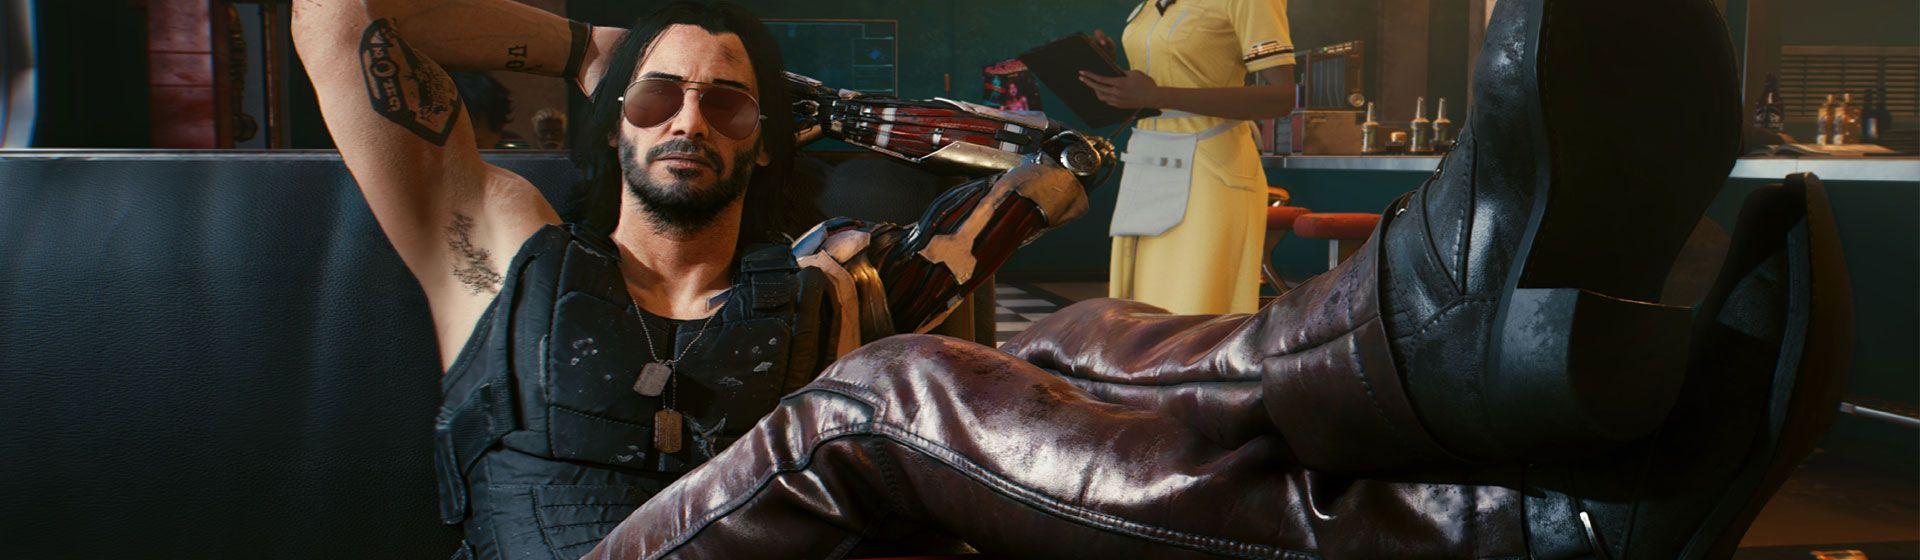 Keanu Reeves estrelando: 'Cyberpunk 2077' 10